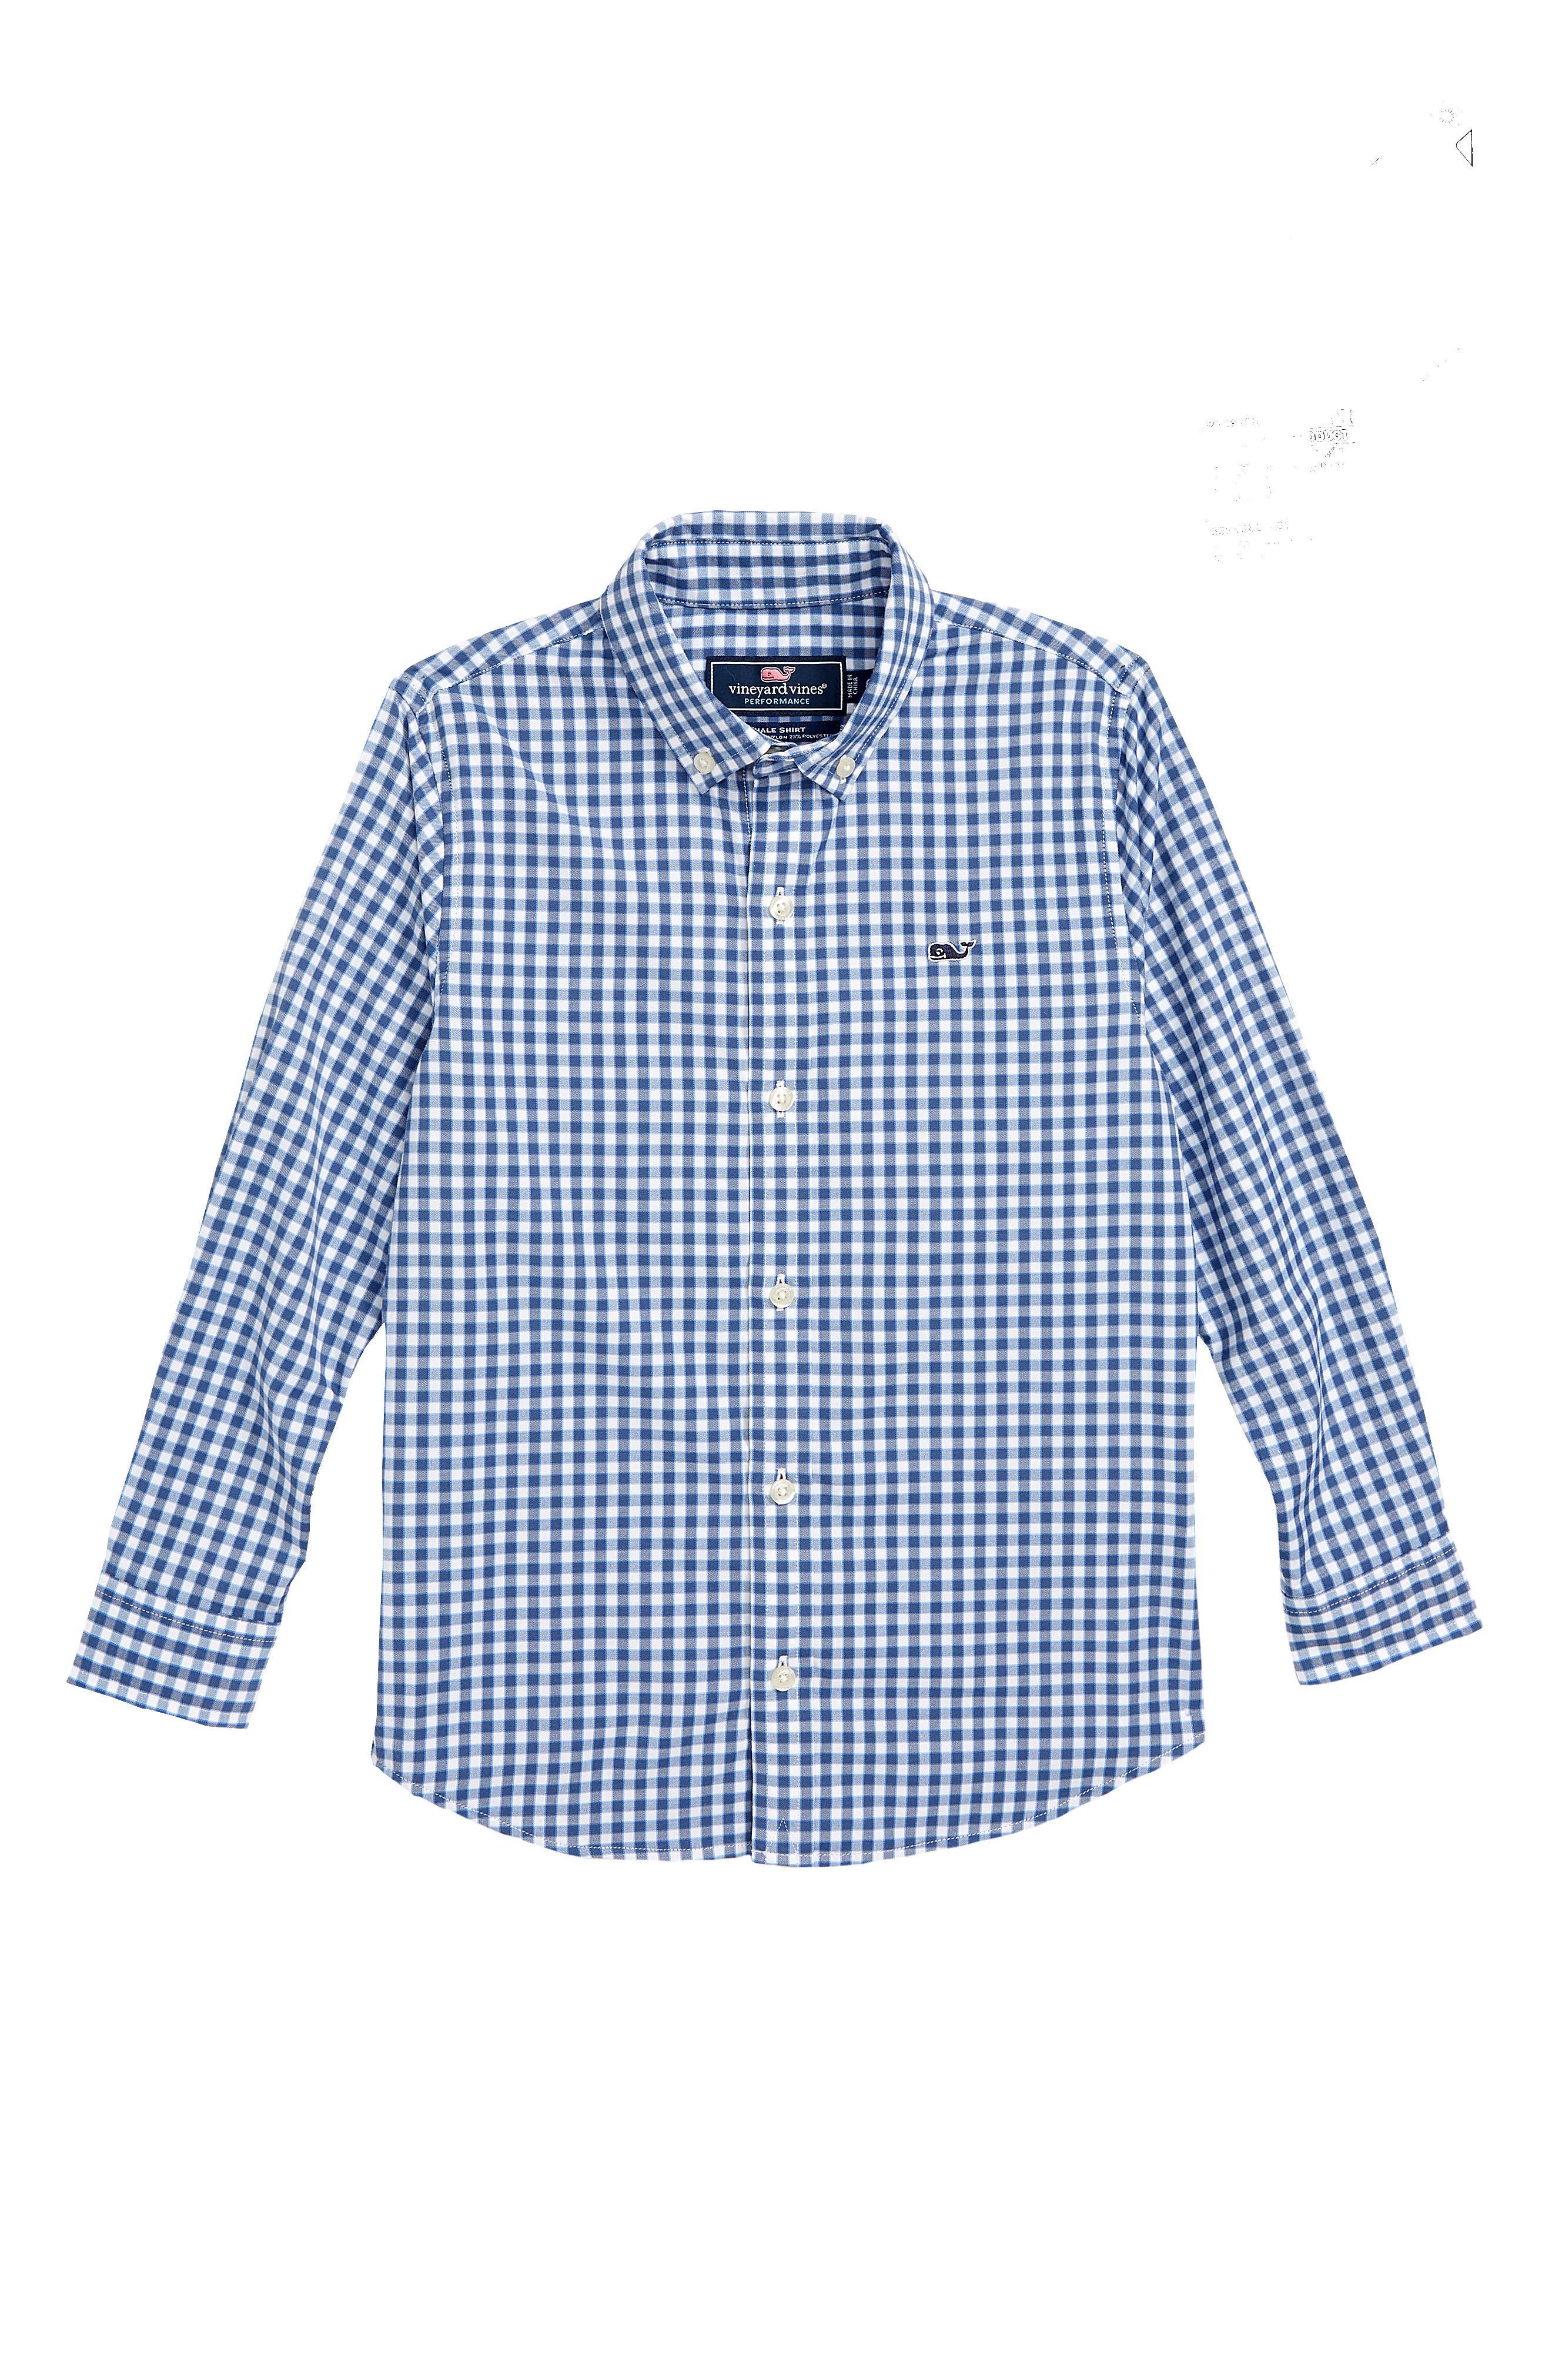 Boys Vineyard Vines Gingham Whale Button Down Shirt Size XL (18)  Blue